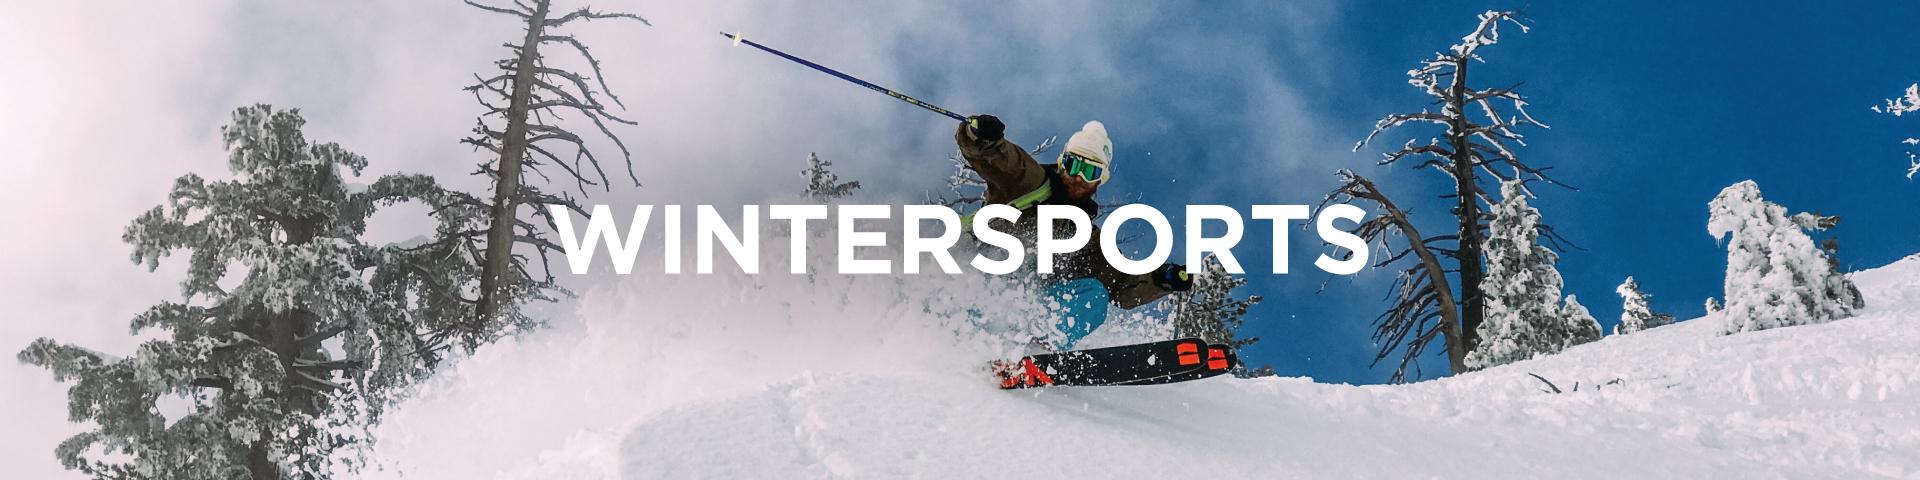 Wintersports Department